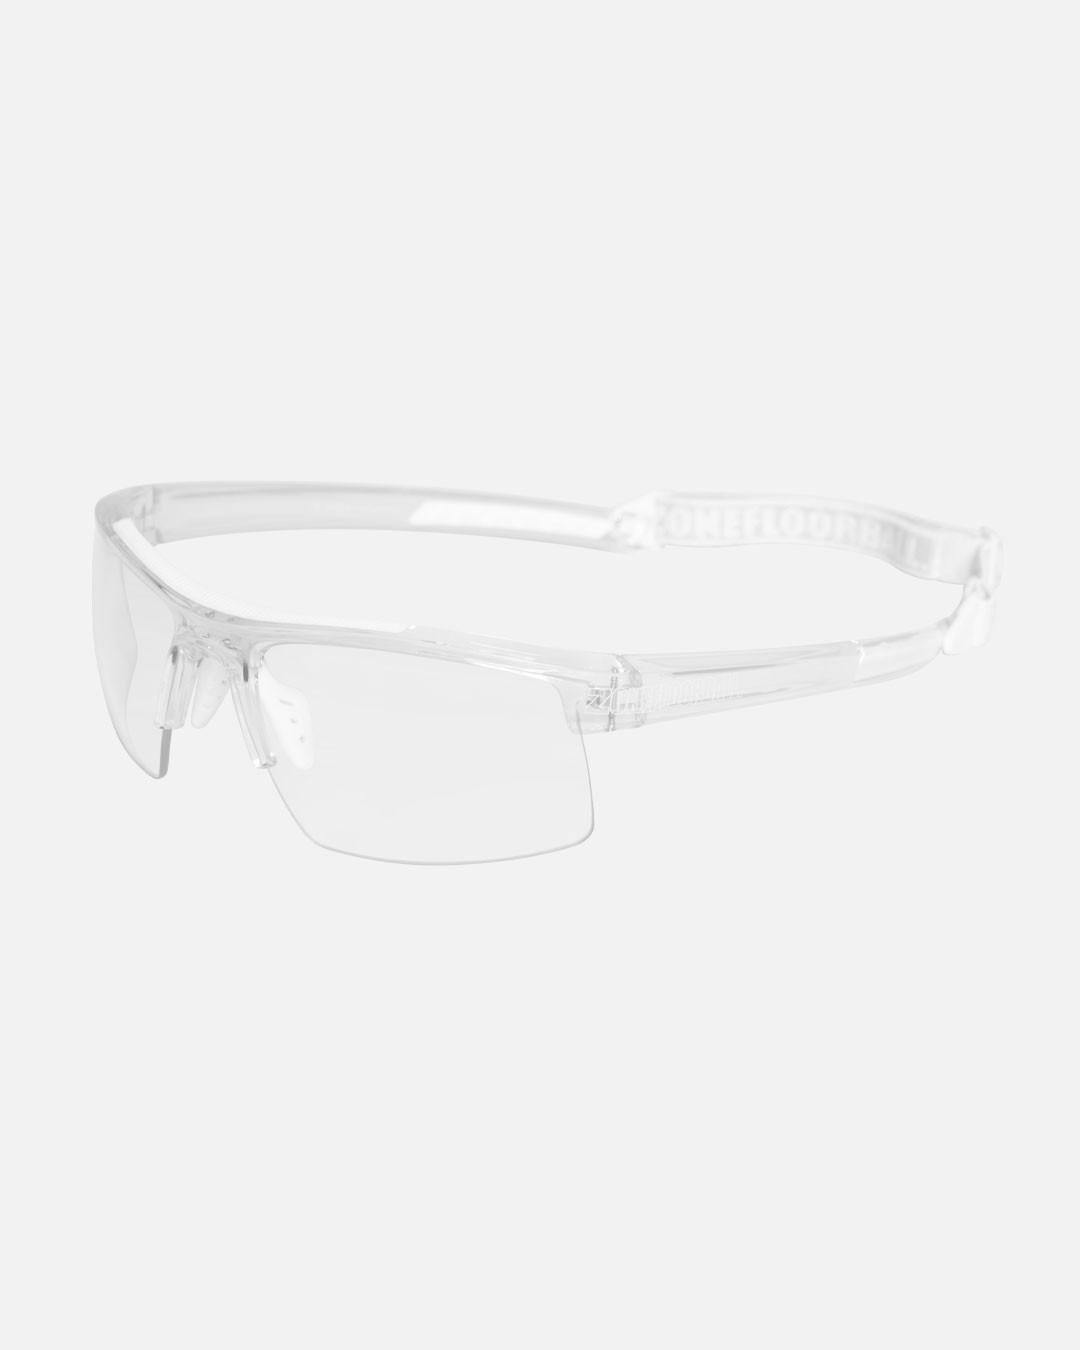 PROTECTOR SPORT GLASSES JUNIOR TRANSPARENT/WHITE